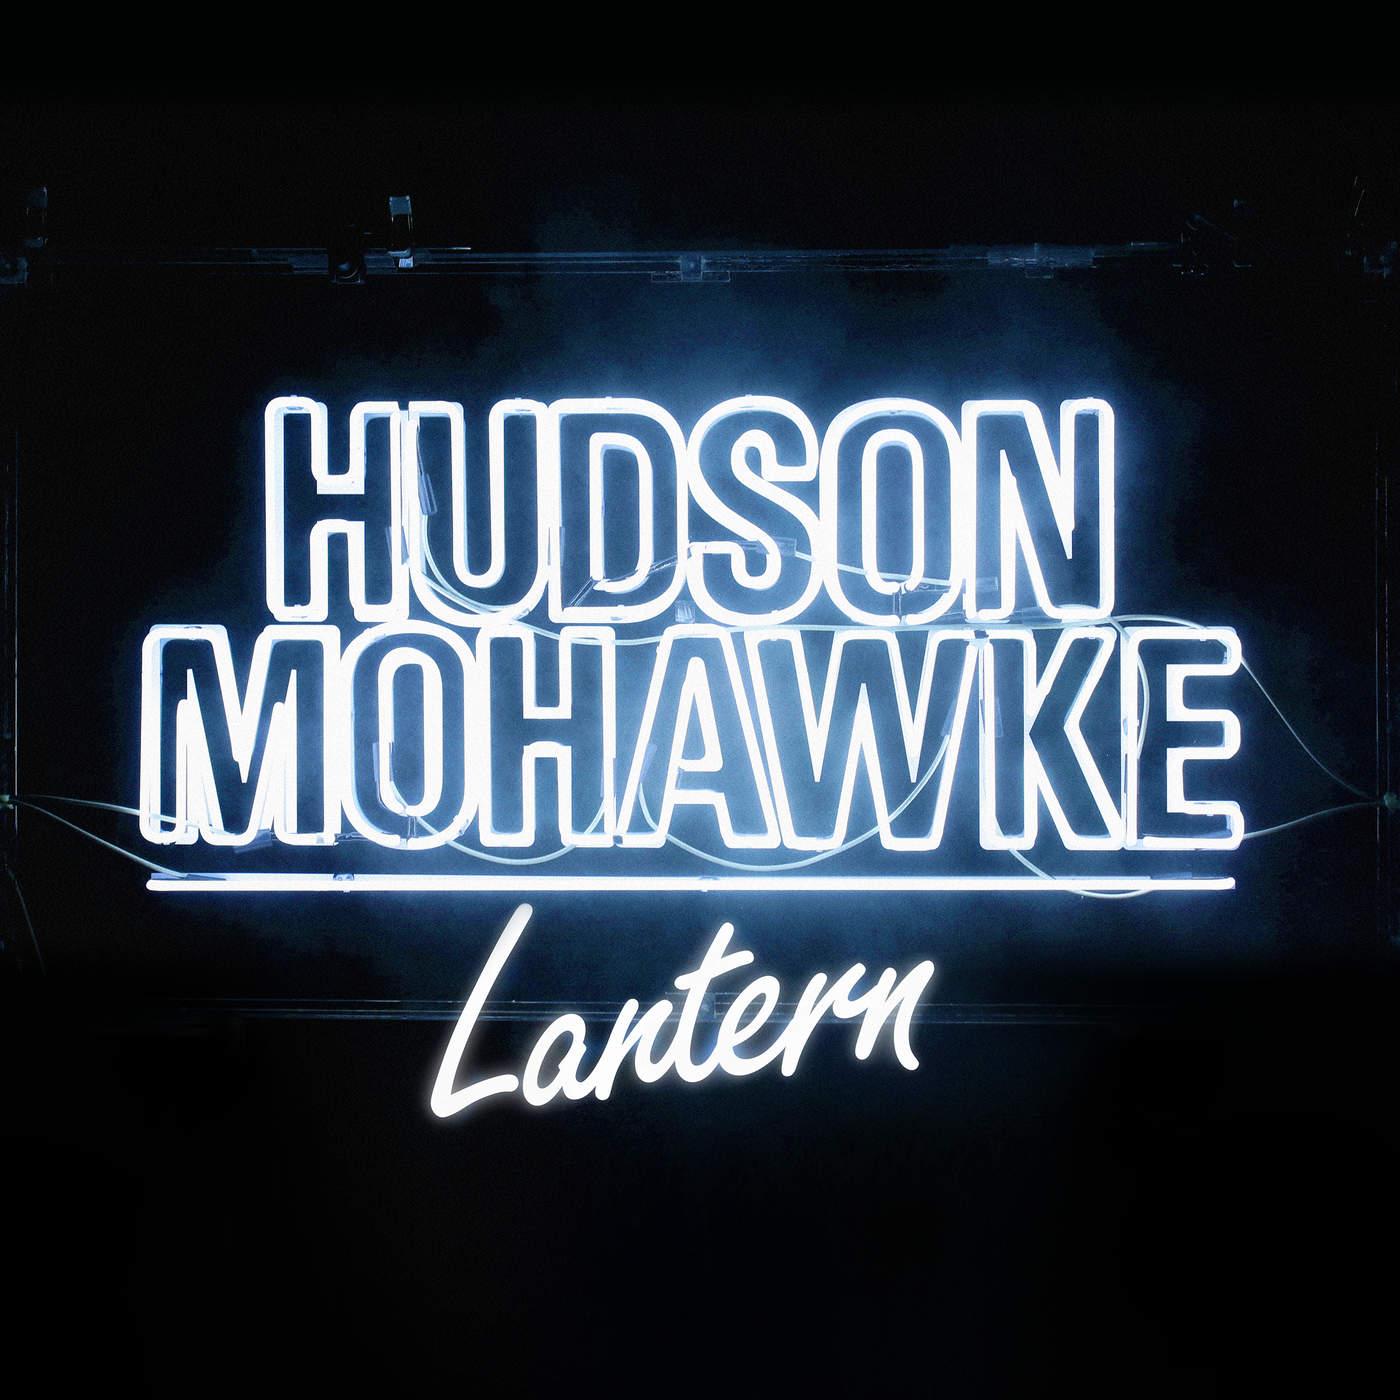 Hudson Mohawke - Lantern Cover